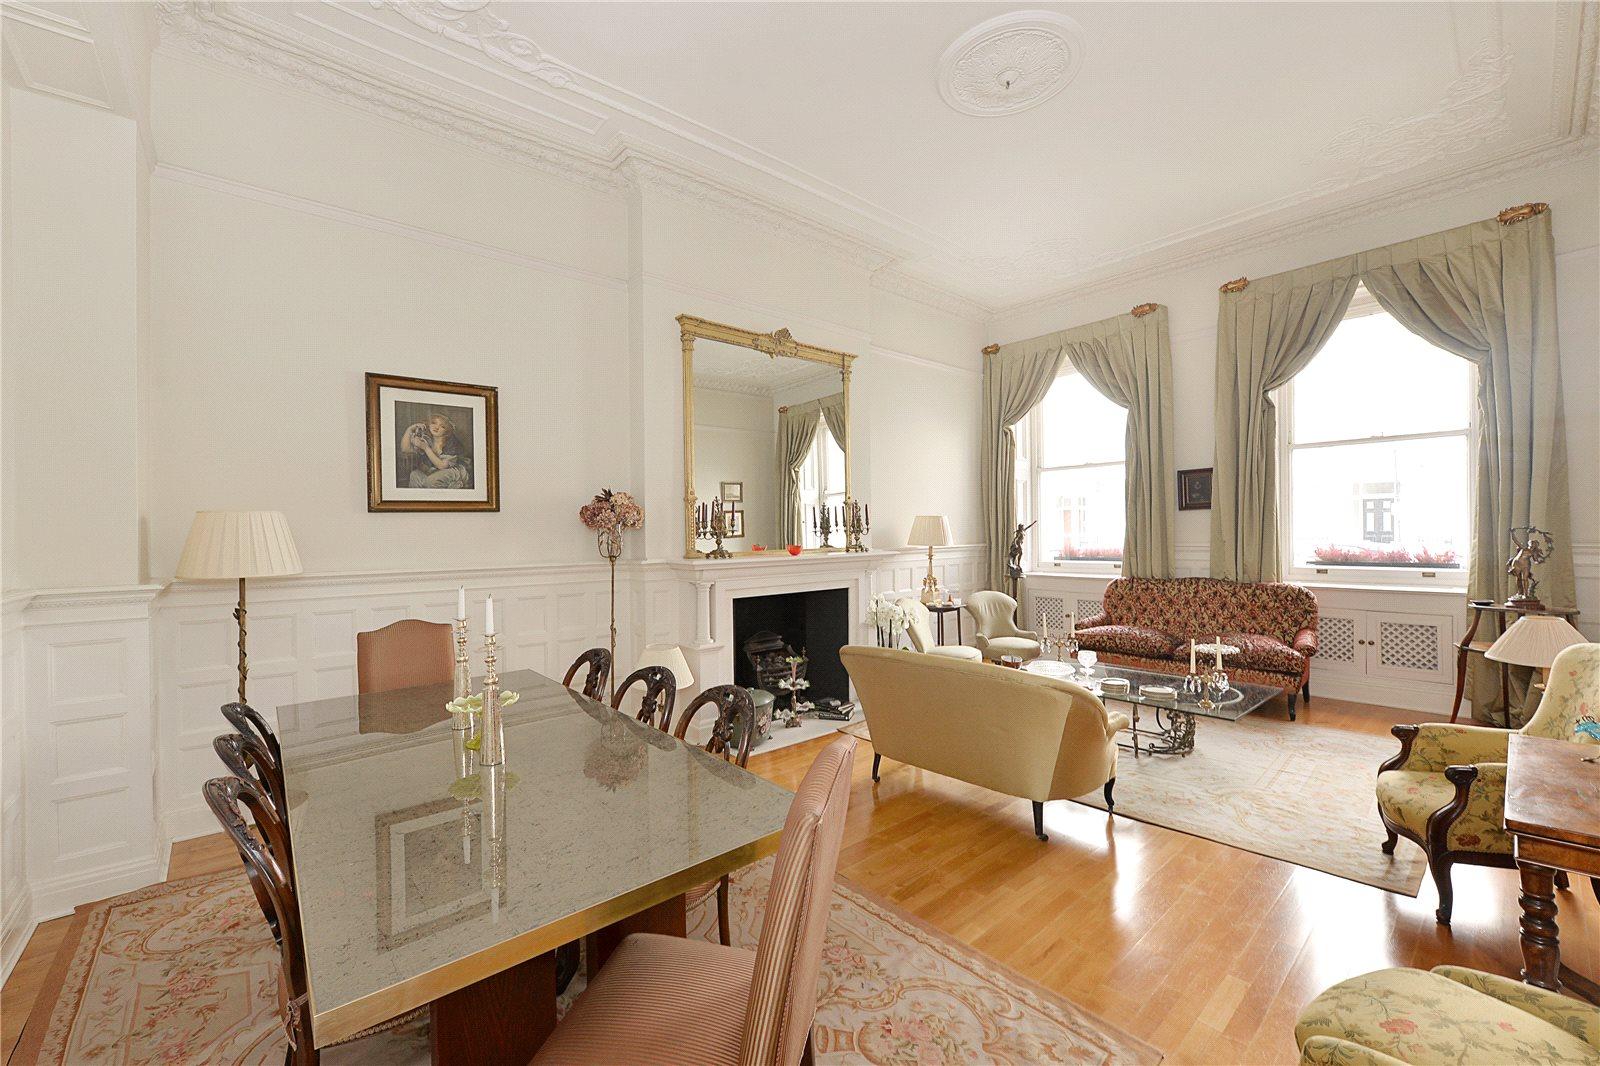 Апартаменты / Квартиры для того Продажа на Queen's Gate Terrace, South Kensington, London, SW7 South Kensington, London, Англия